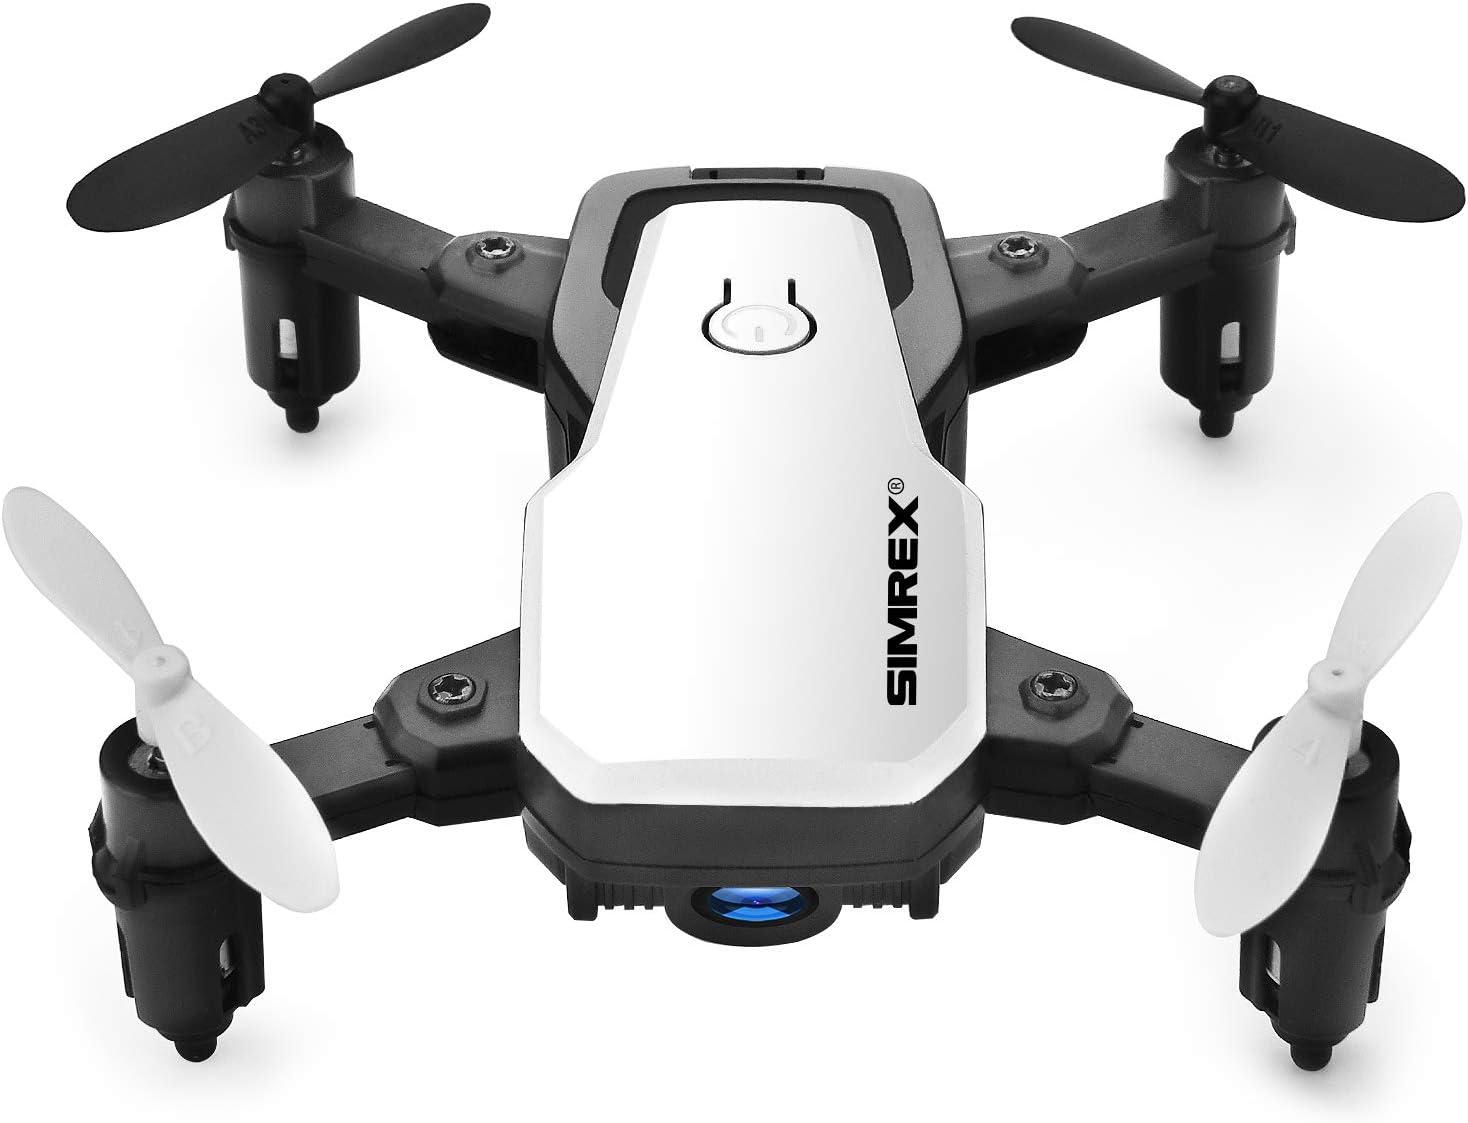 SIMREX X300C Mini Drone con cámara WiFi HD FPV Plegable RC Quadcopter RTF 4CH 2.4GHz Control Remoto sin Cabeza Control de altitud Super Easy Fly para Entrenamiento Blanco